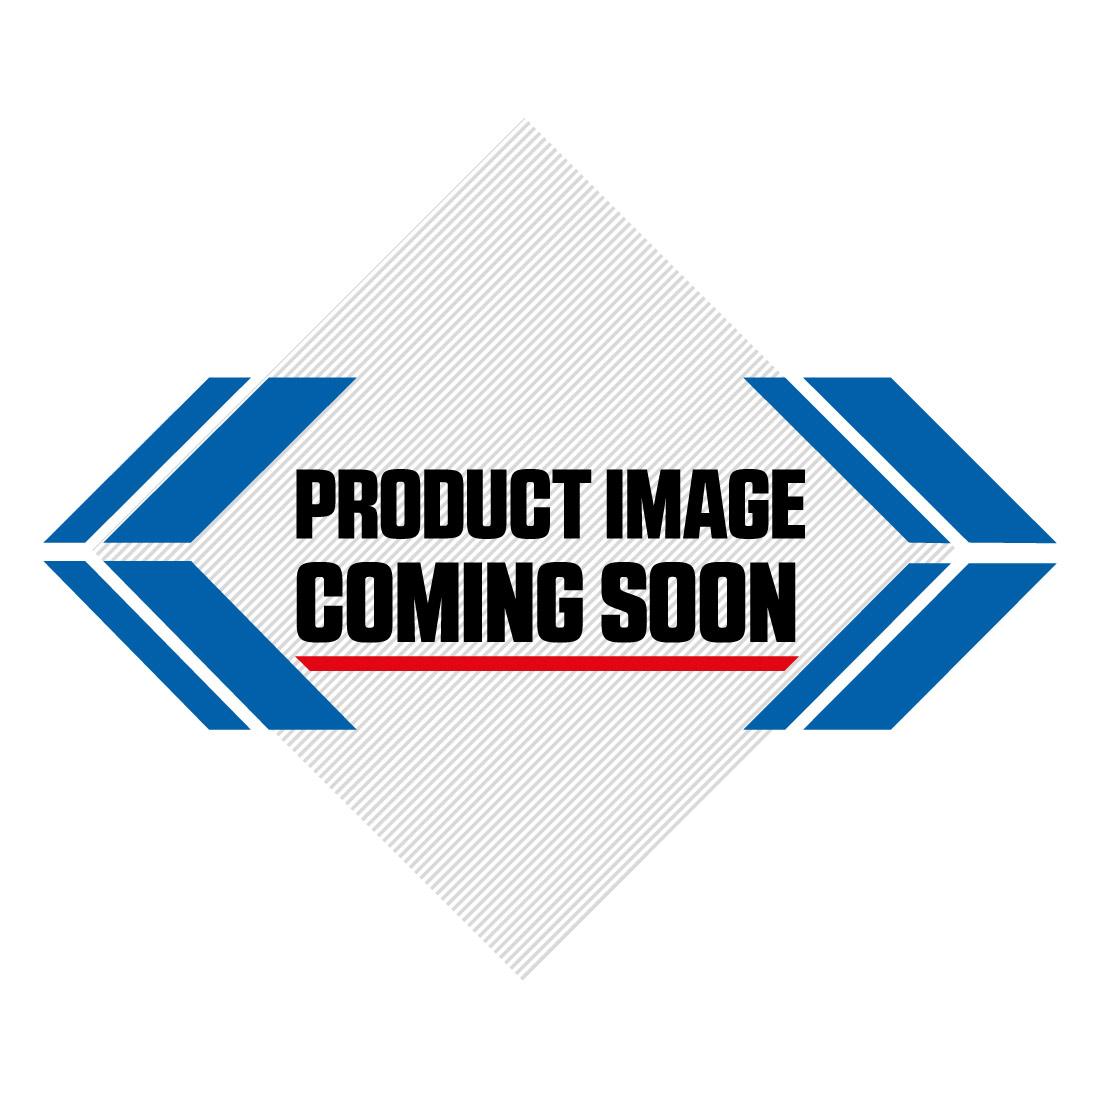 100% Armega Forecast Dual Pane Replacement Goggle Lens Image-0